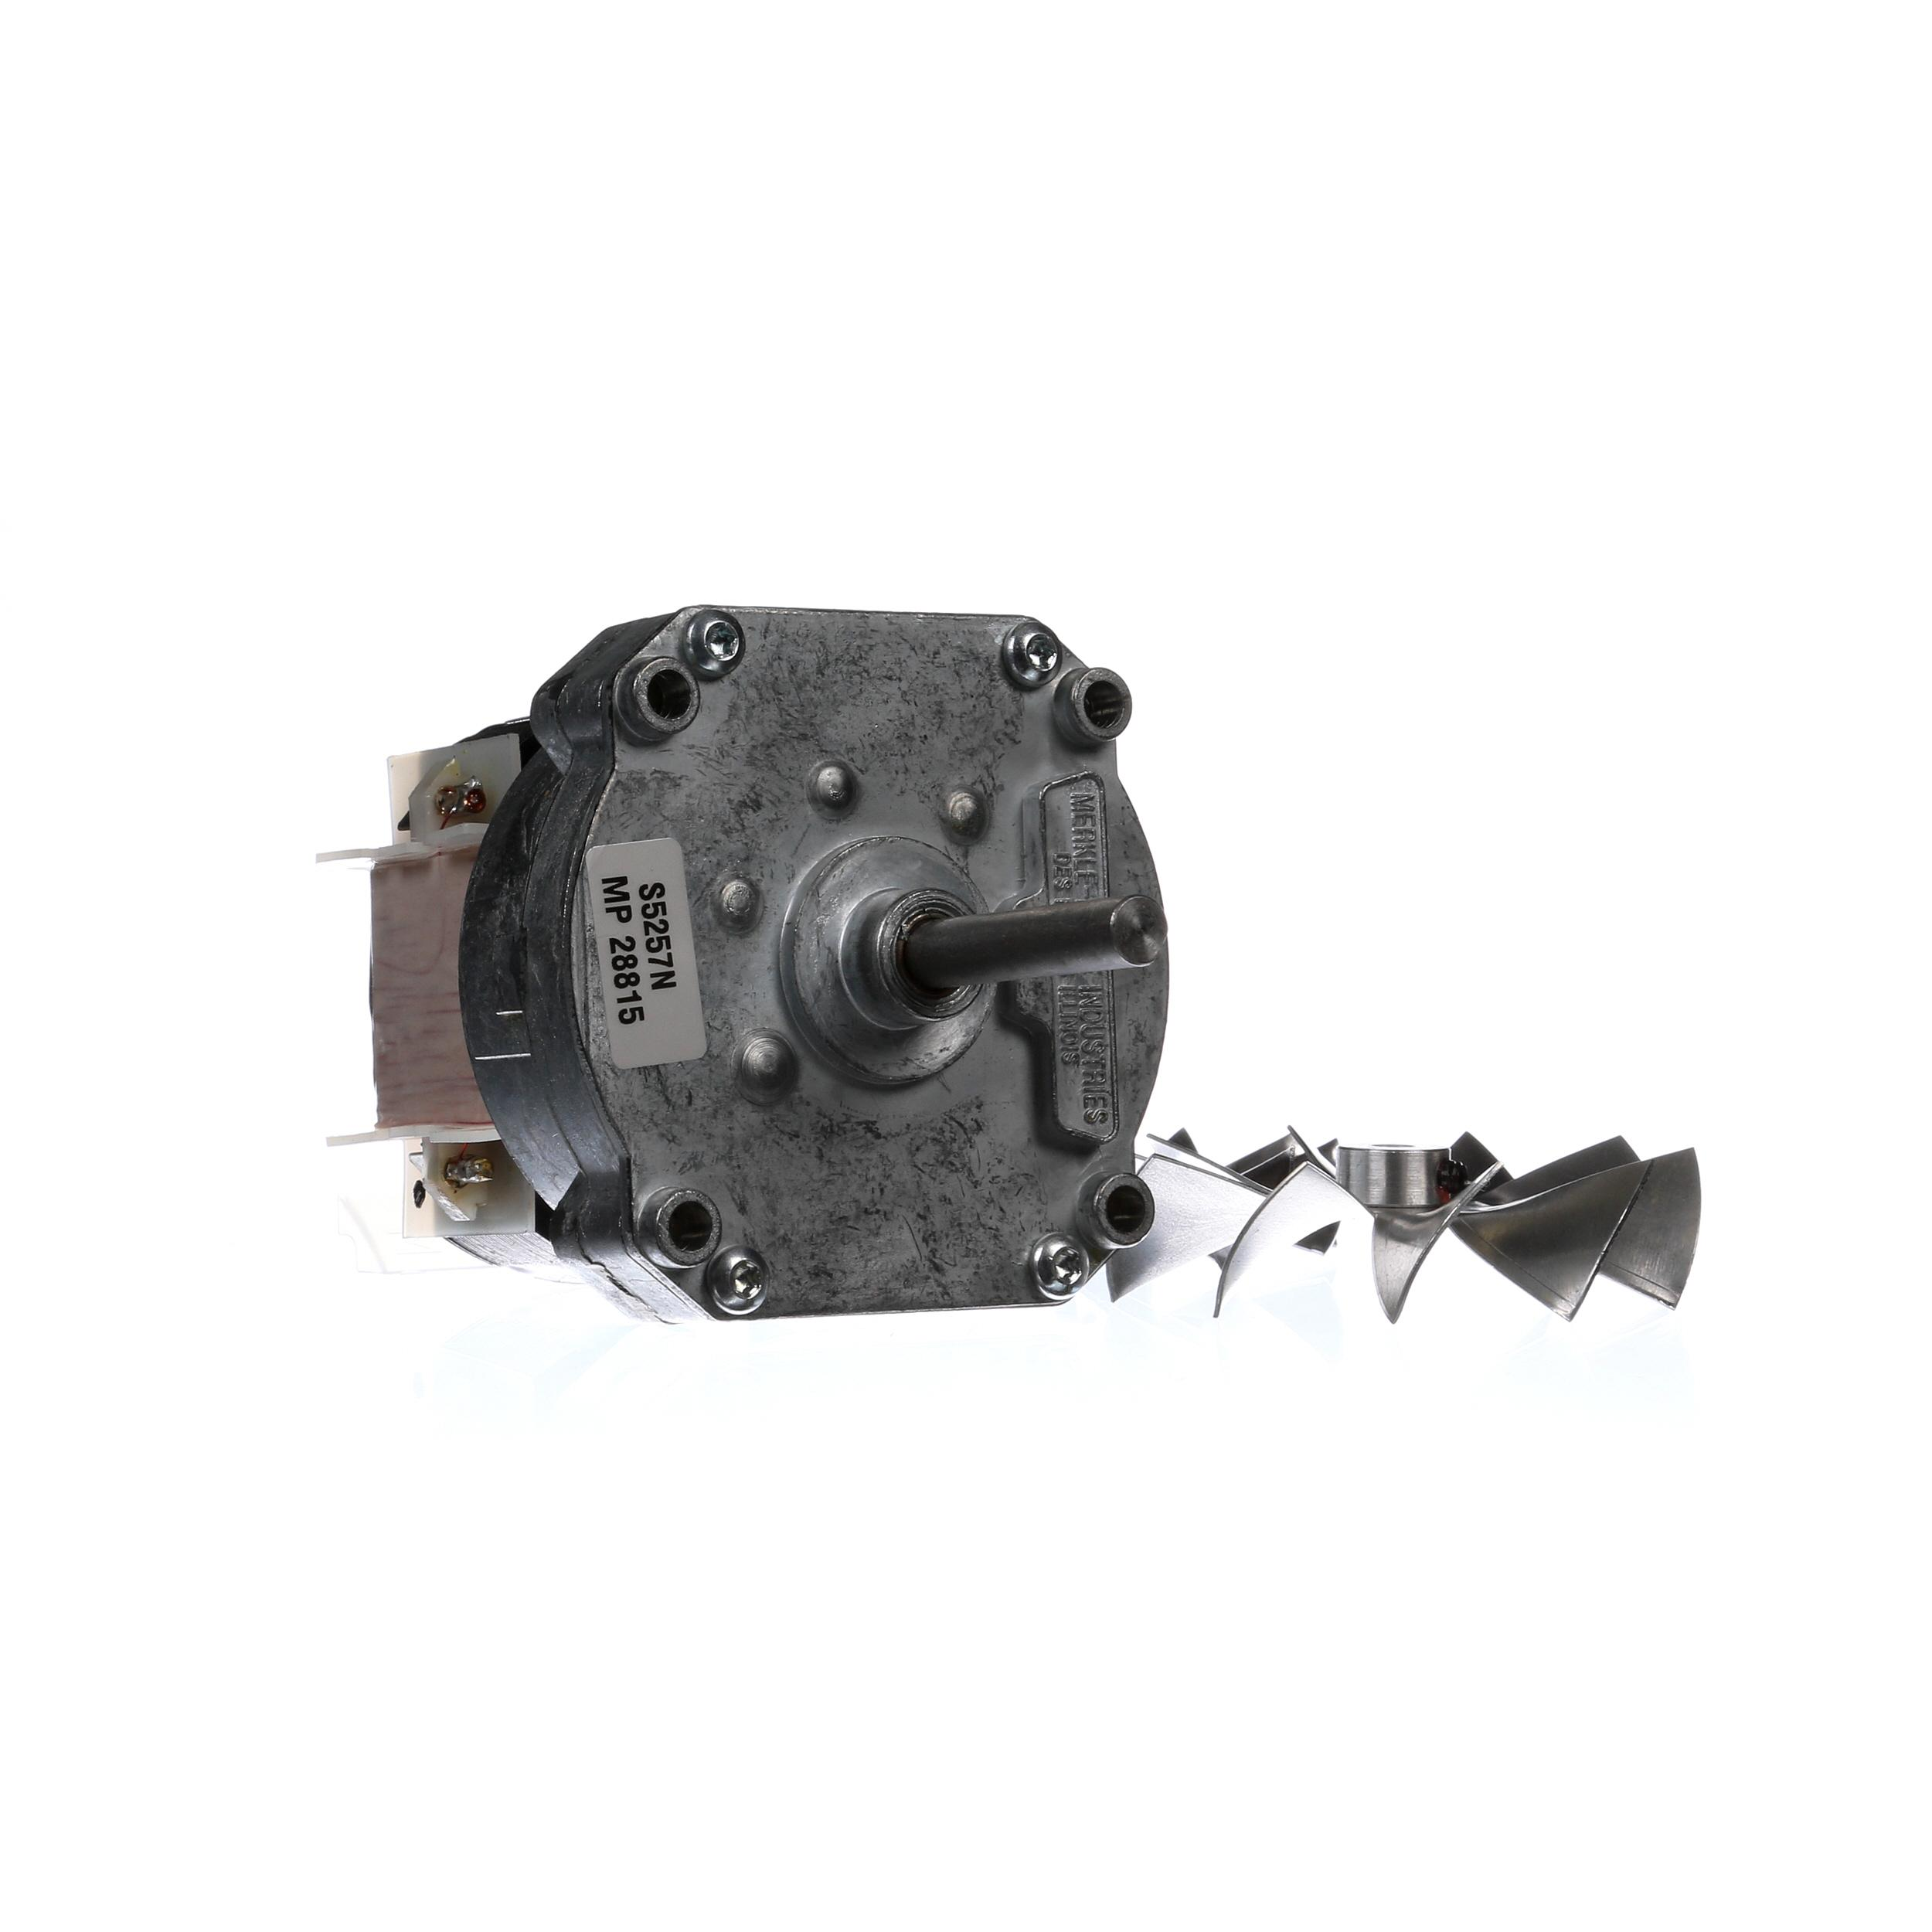 HATCO GEARMOTOR 6 RPM 208V